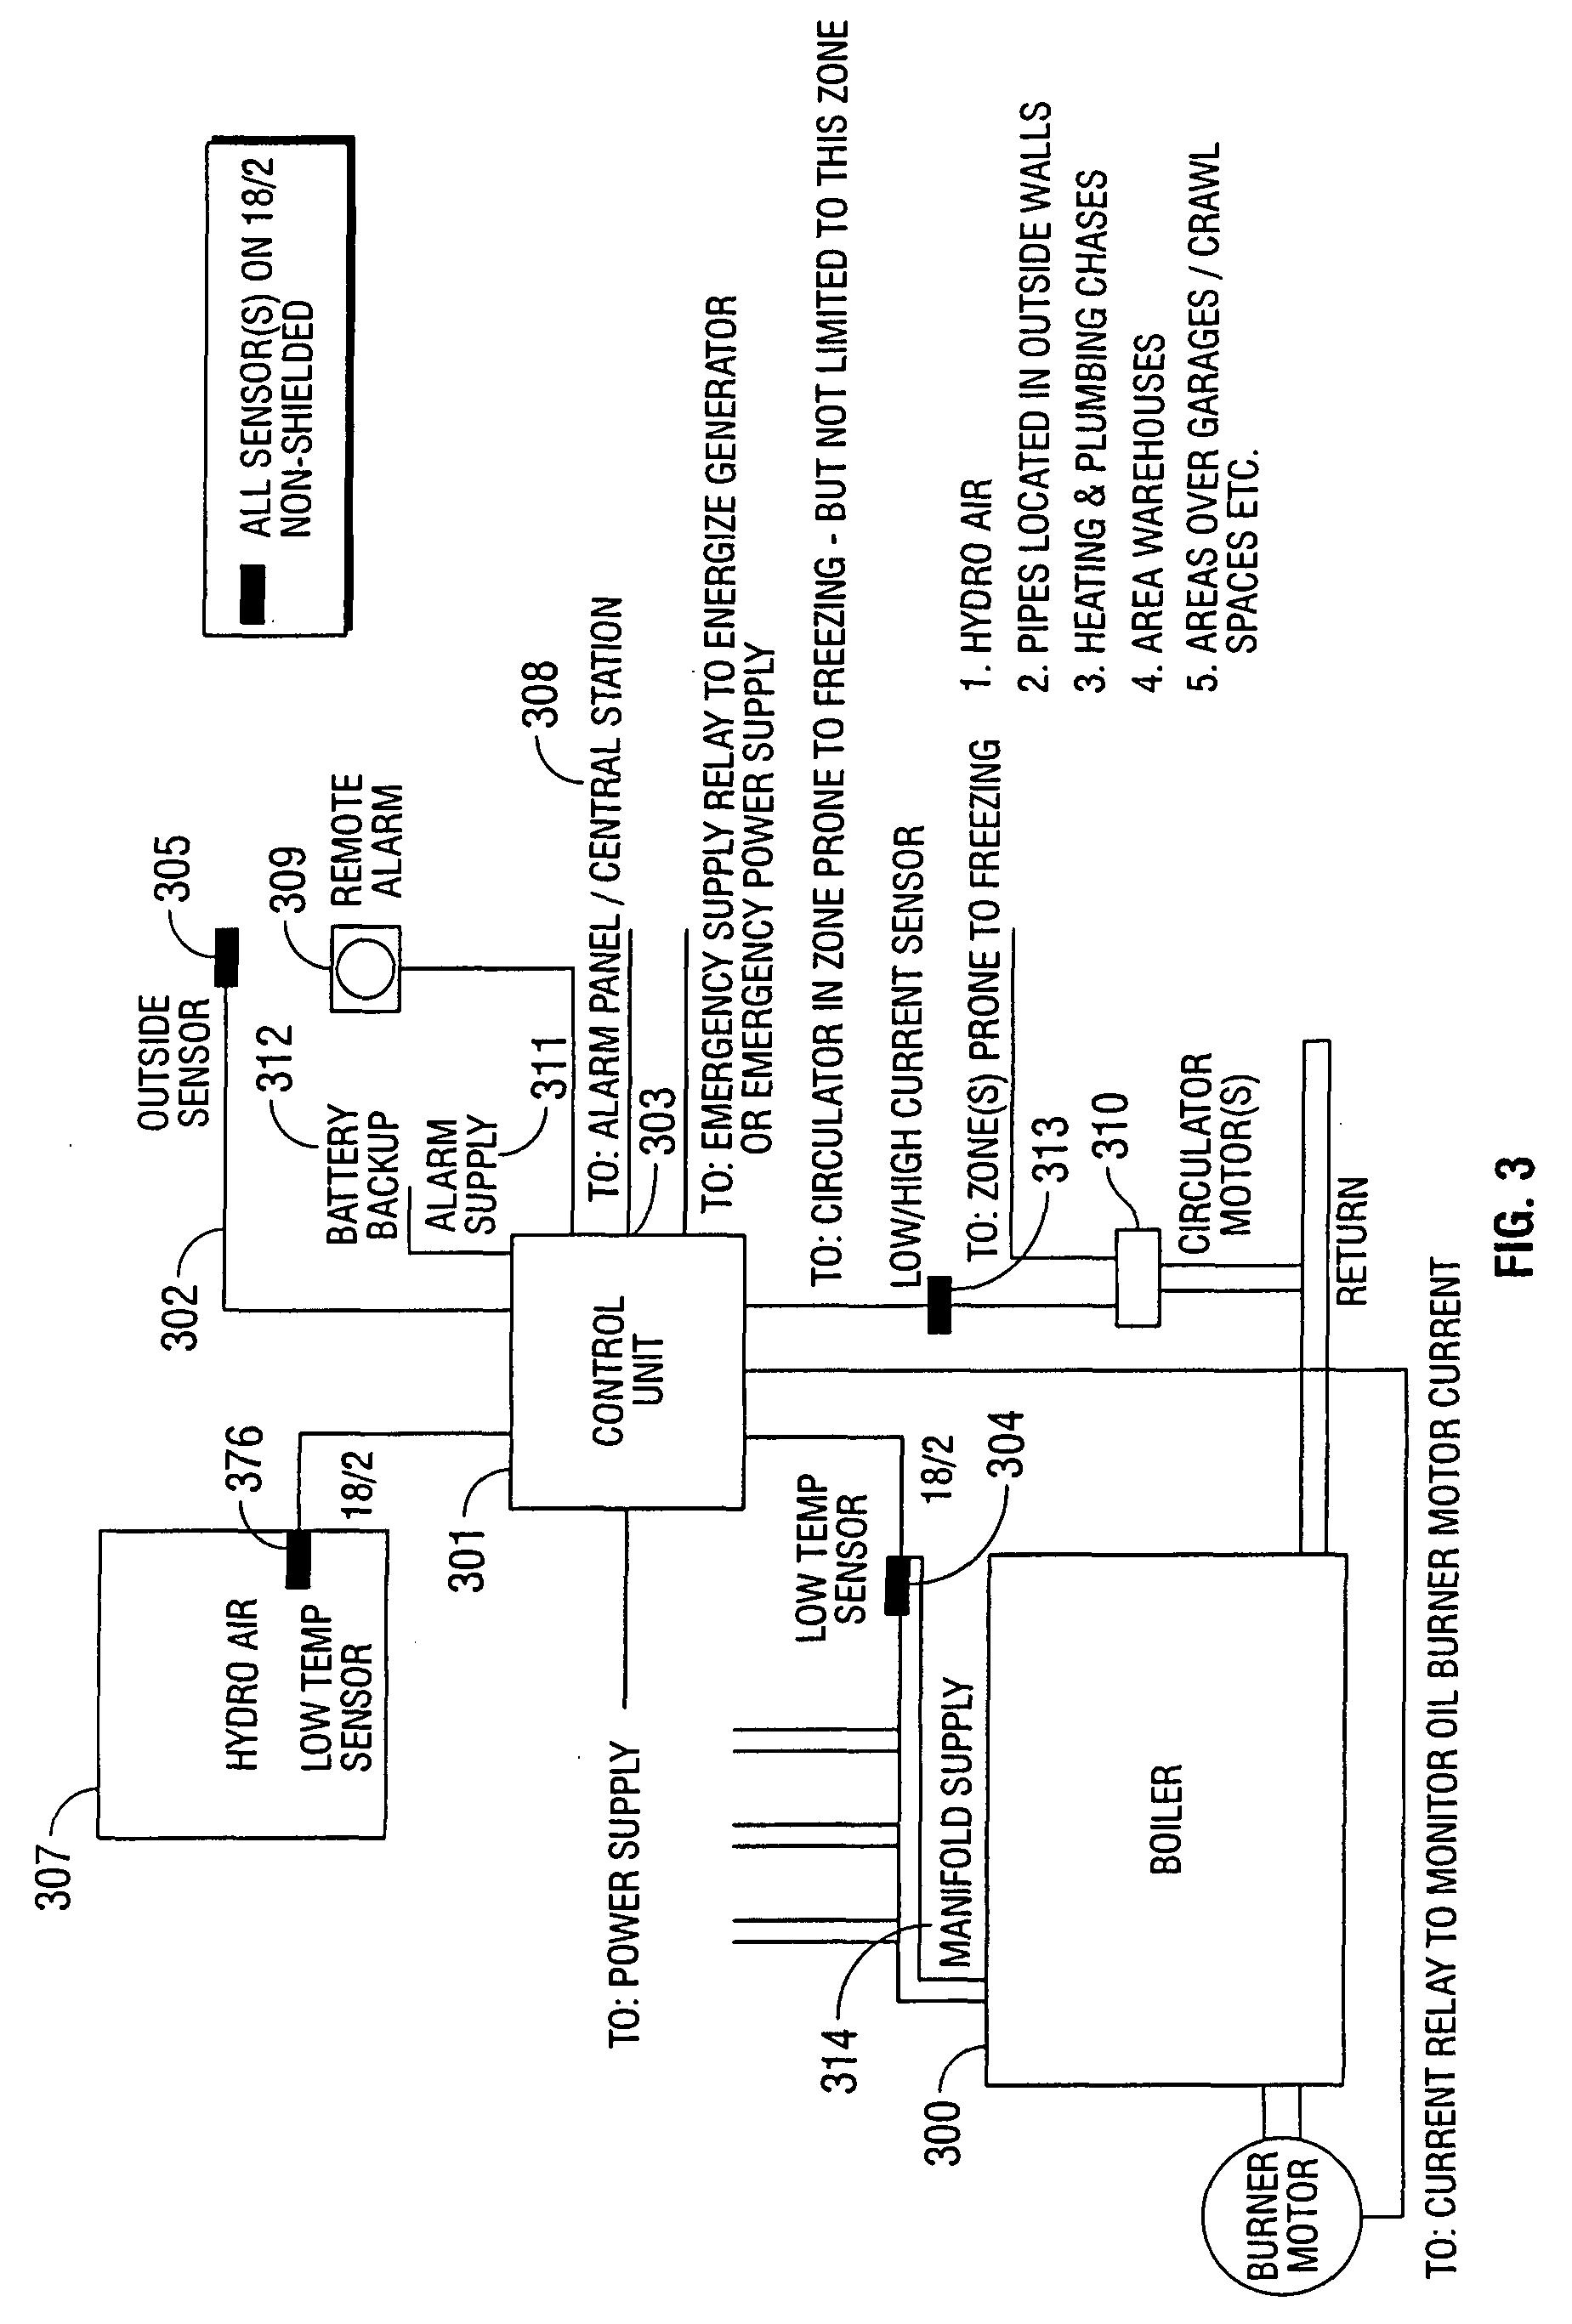 name wiring2520batteriesjpgviews 1157size 294 kb wiring diagramMobile Home Wiring Diagram Get Domain Pictures Getdomainvidscom #6